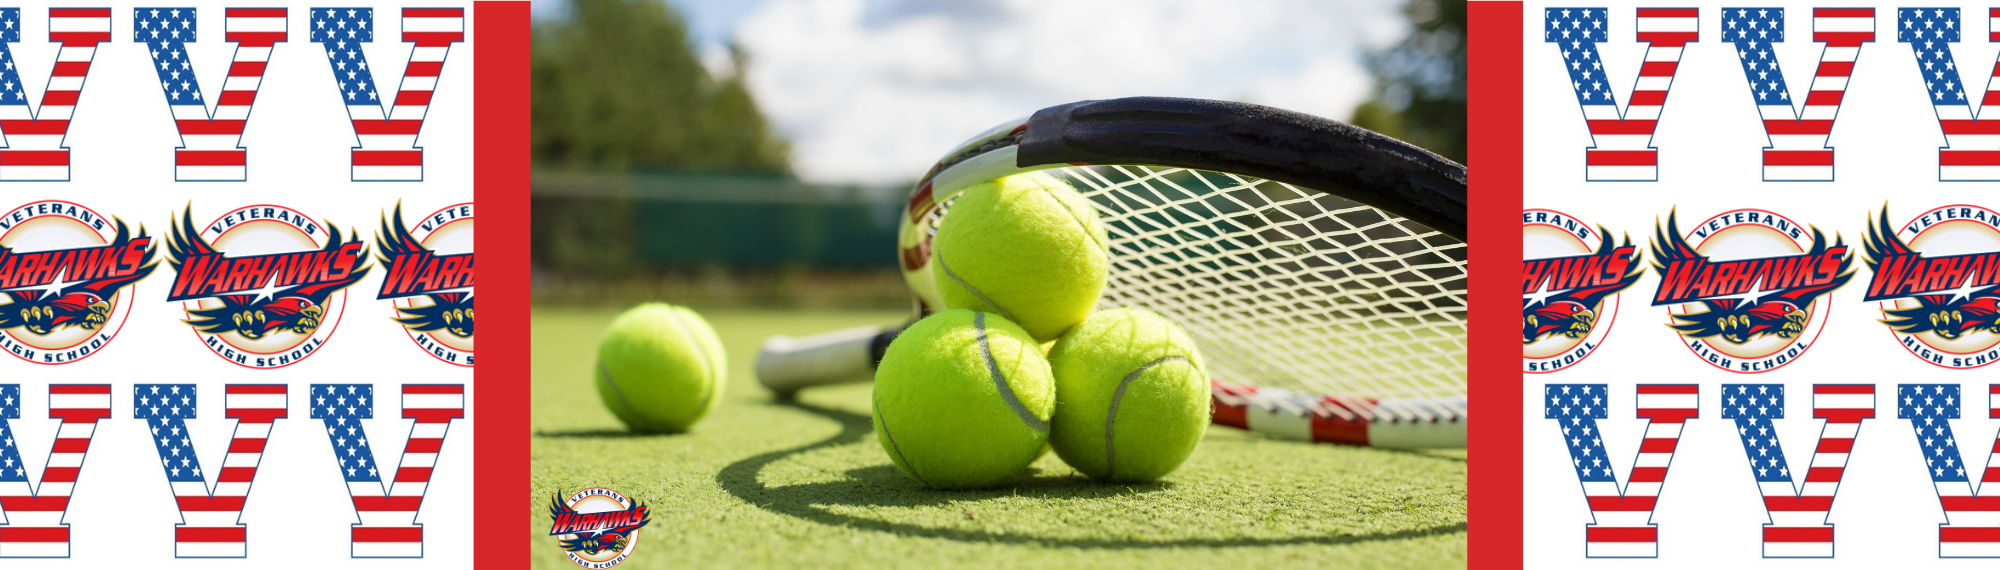 Warhawk Tennis